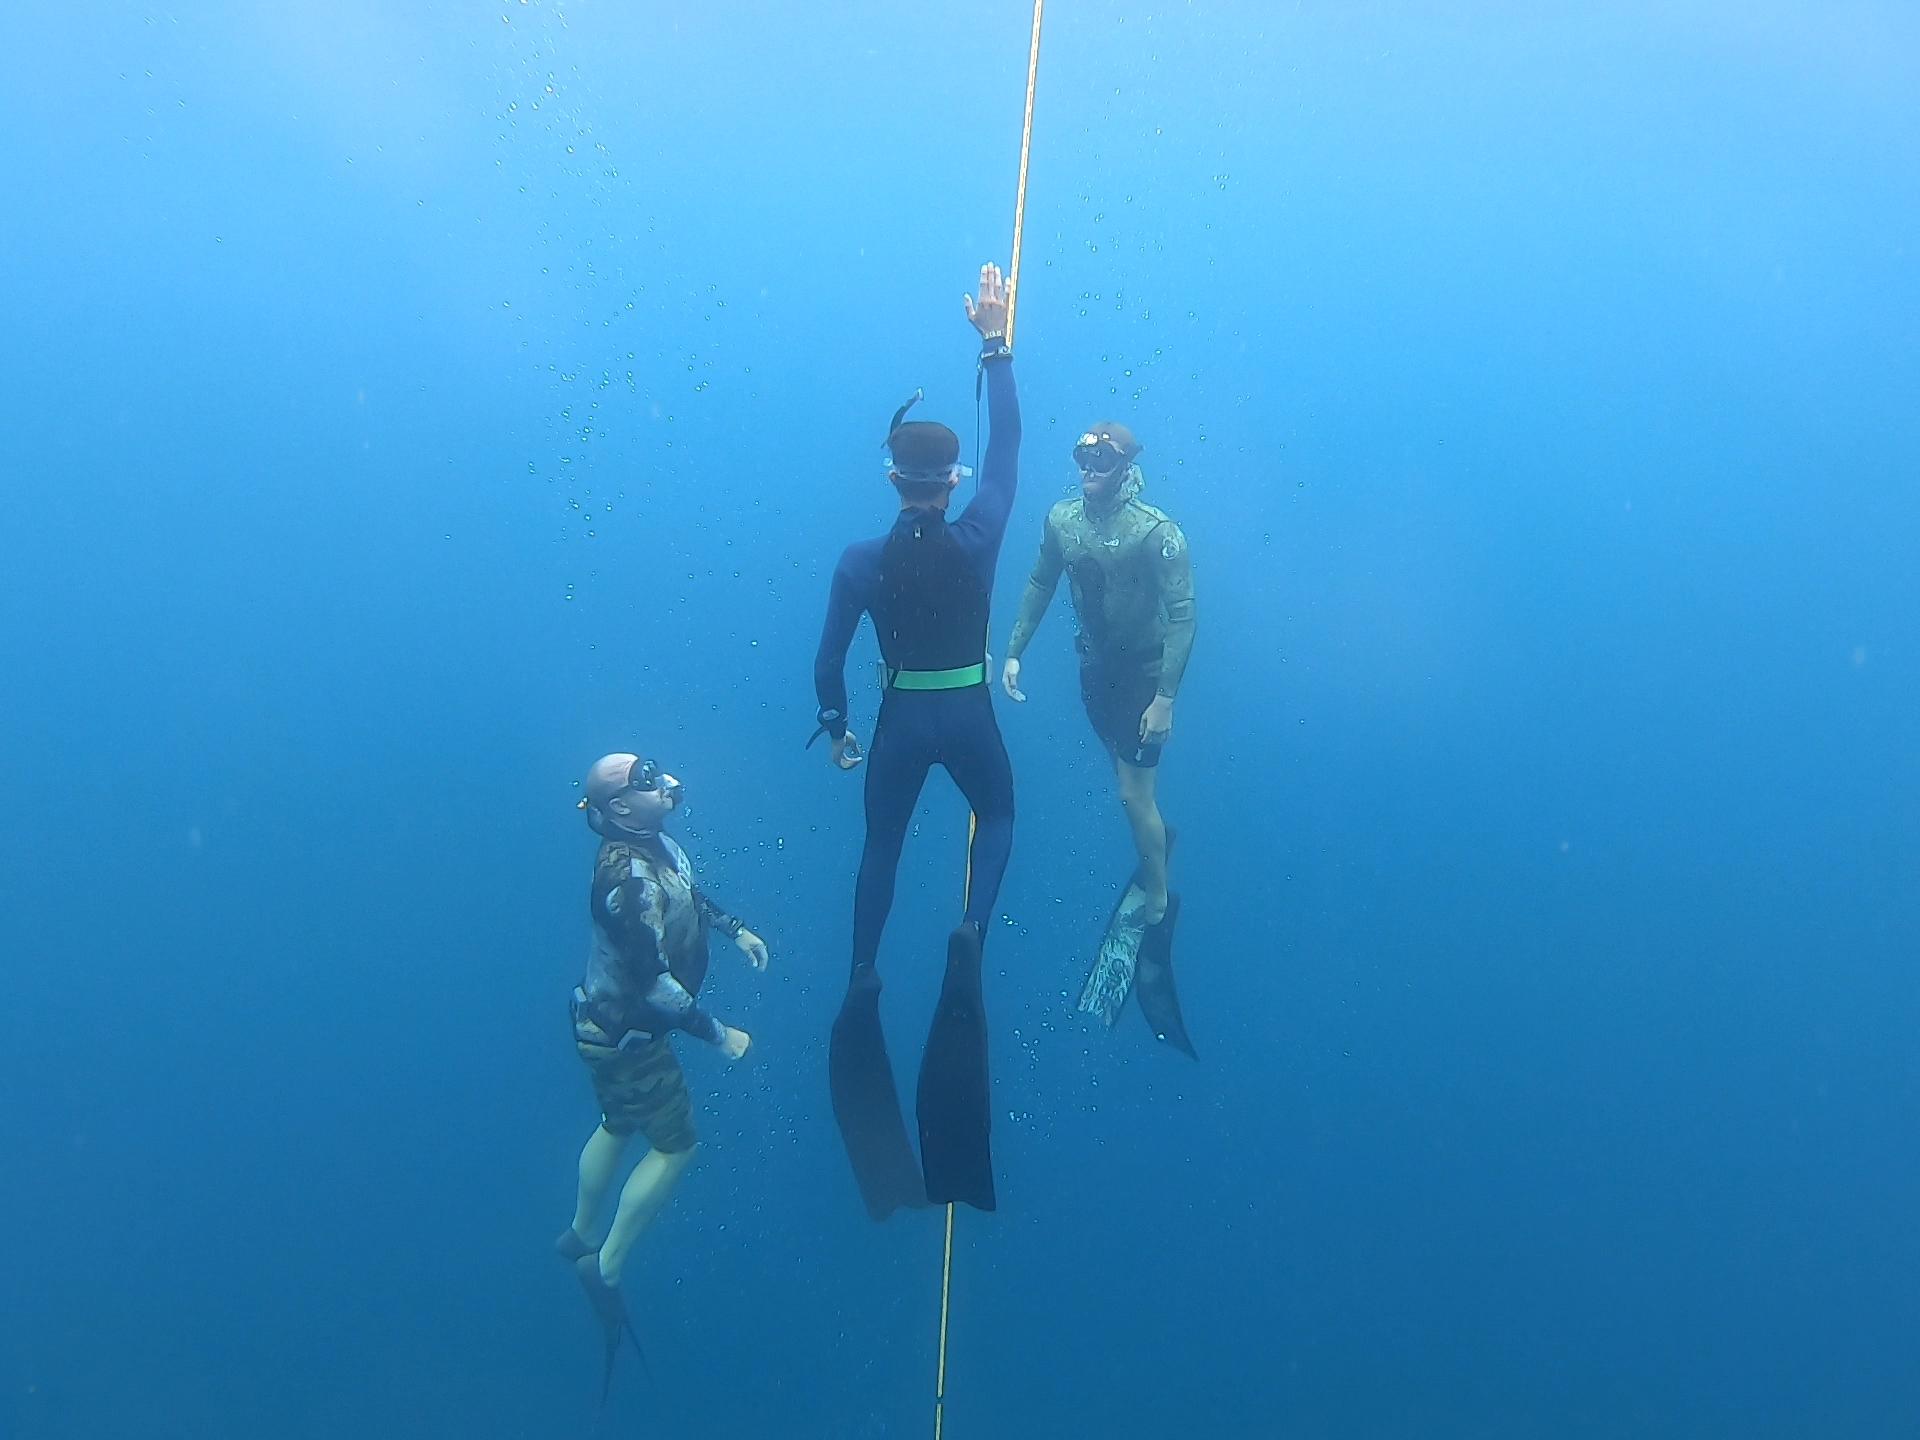 Level 1 Freediving Course | PADI Freediver Course | Quepos, Costa Rica